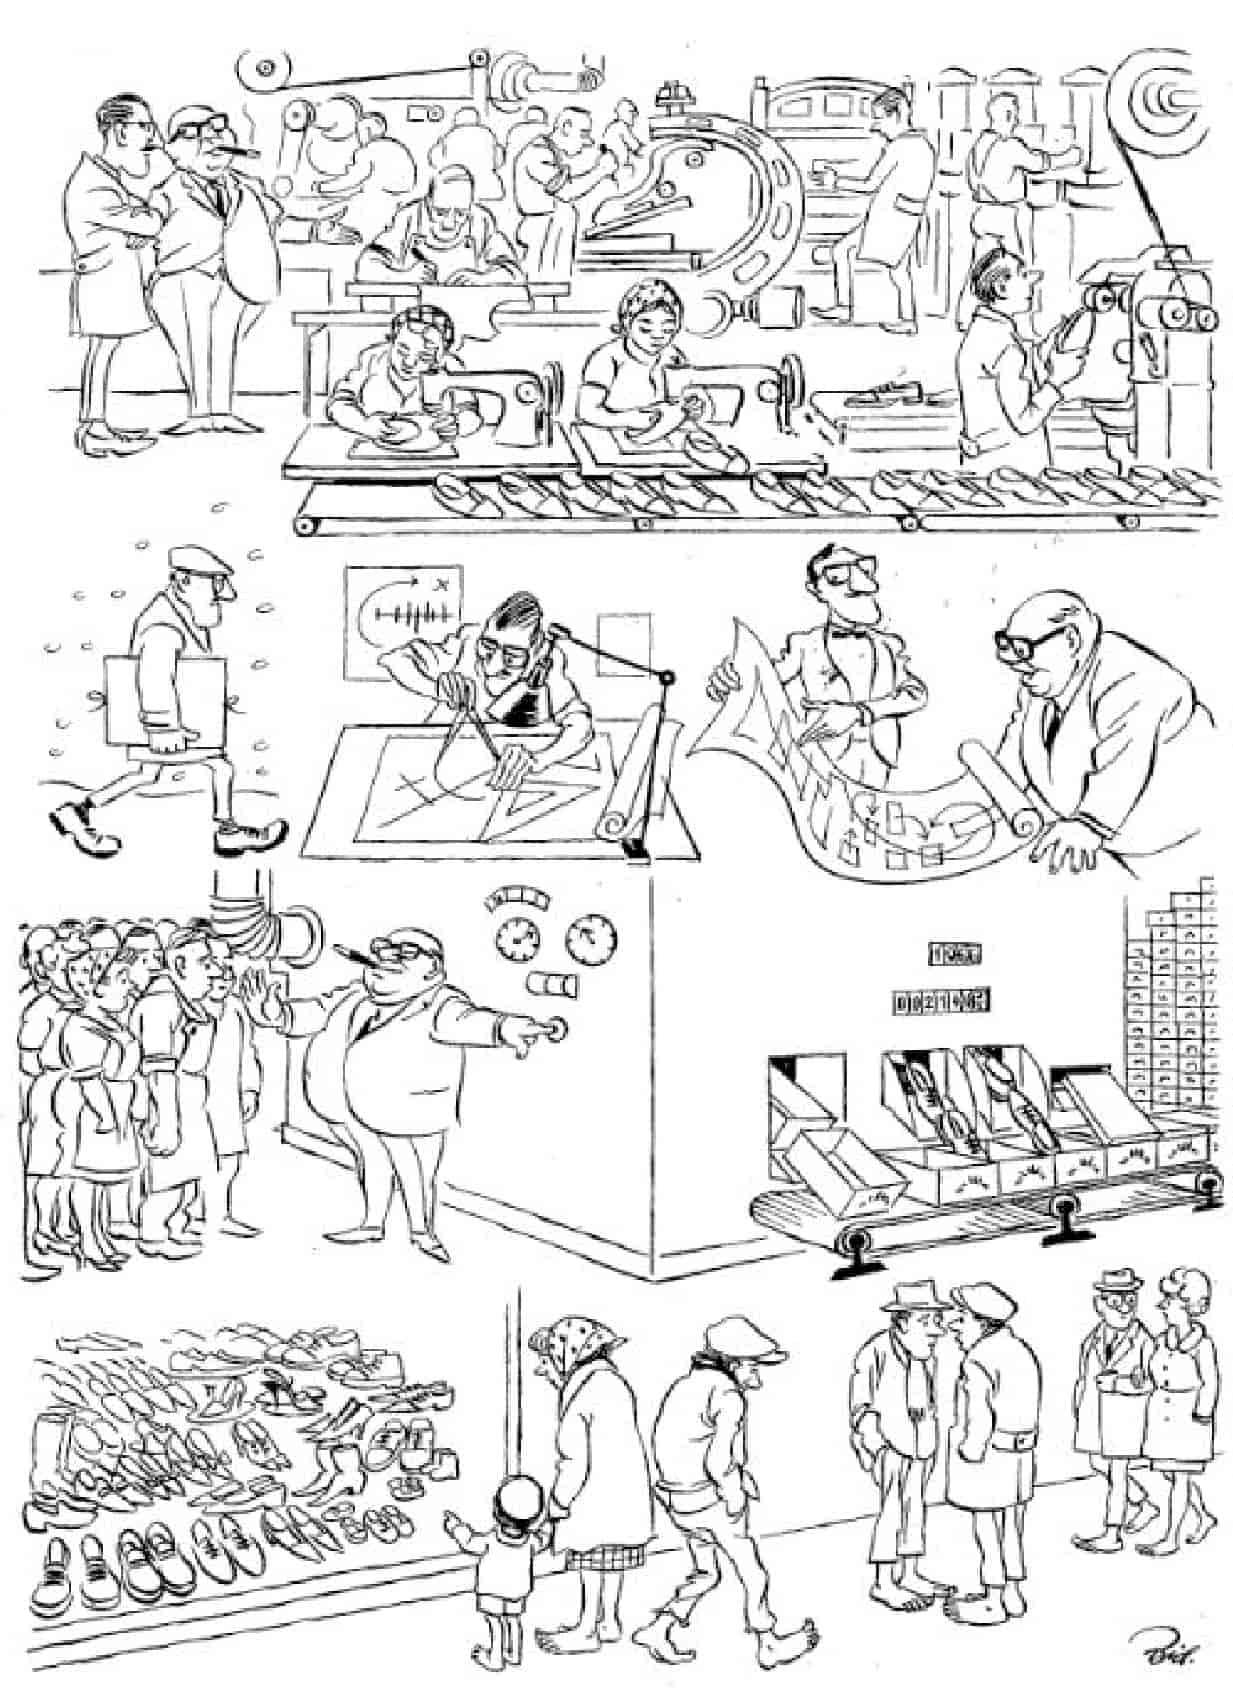 Херлуф Бидструп - Автоматизация